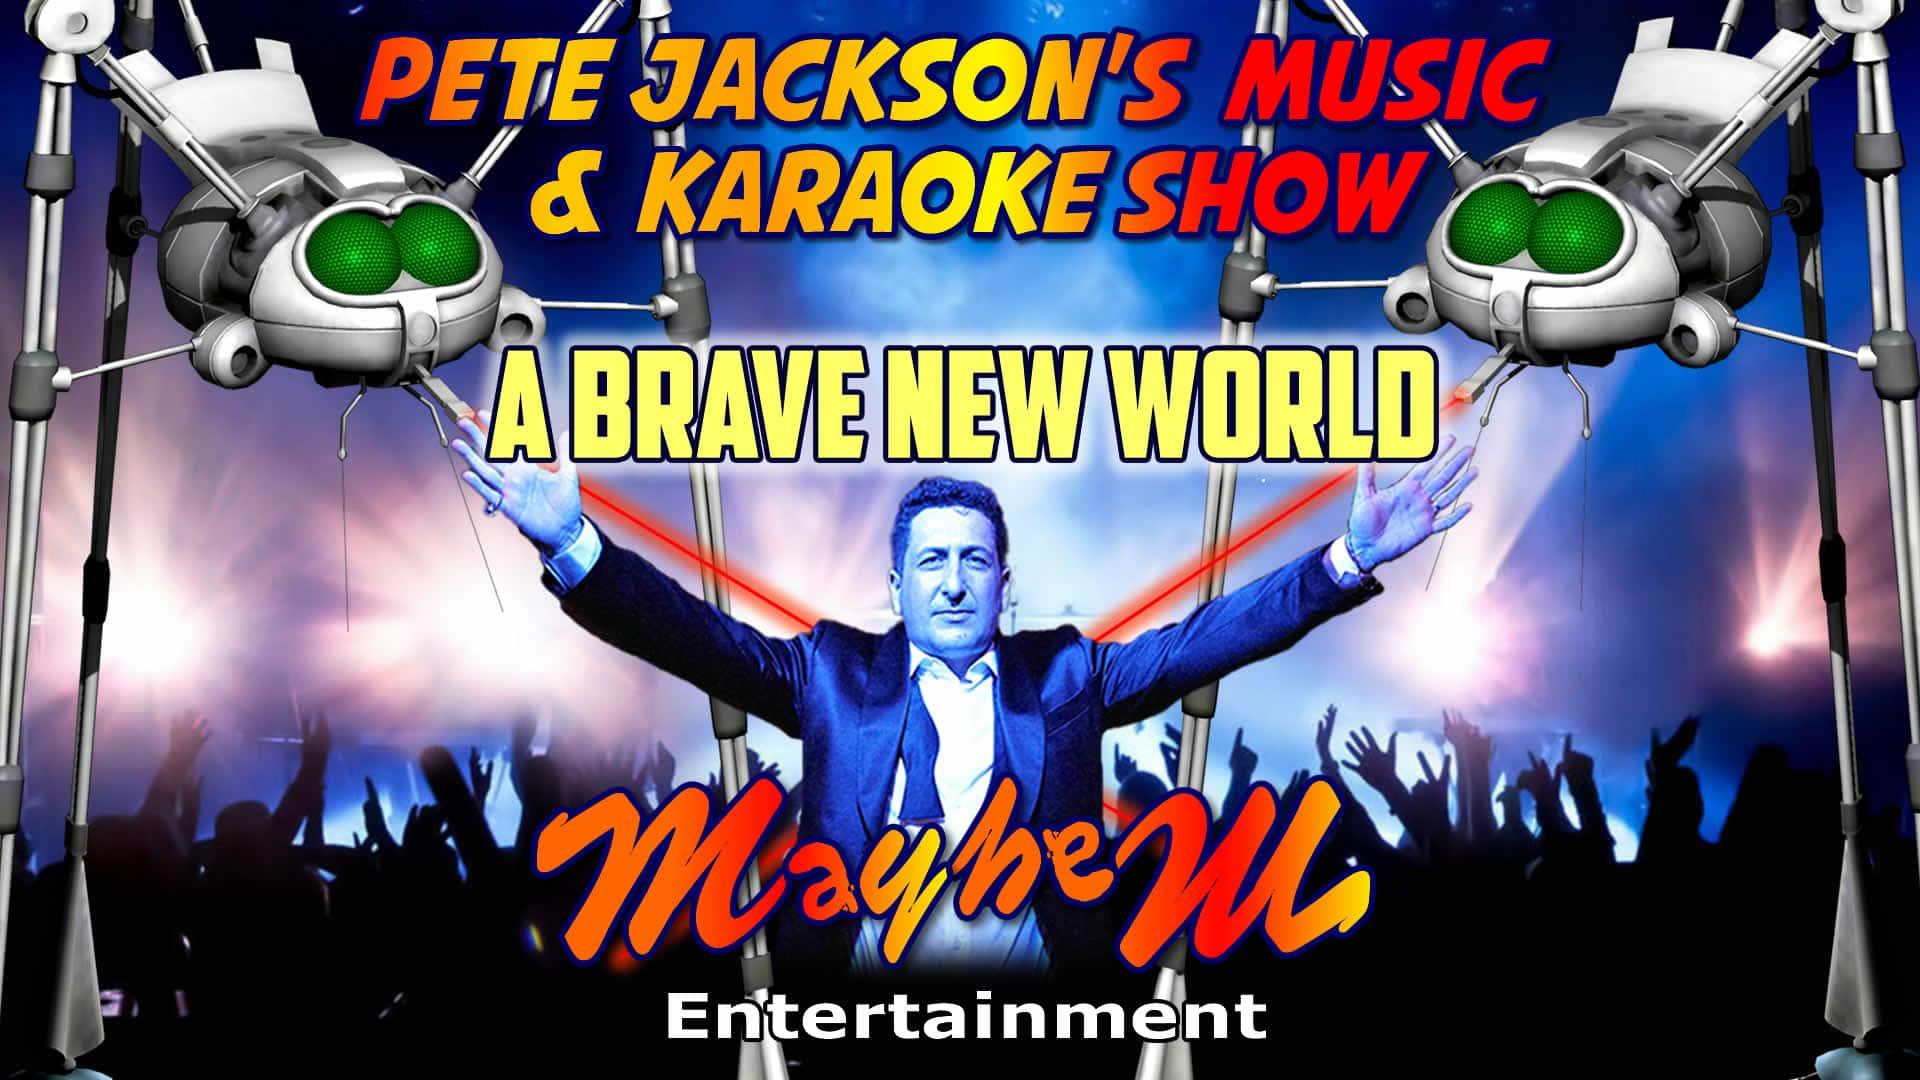 Pete Jackson's Music & Karaoke Shows Rhodes Greece